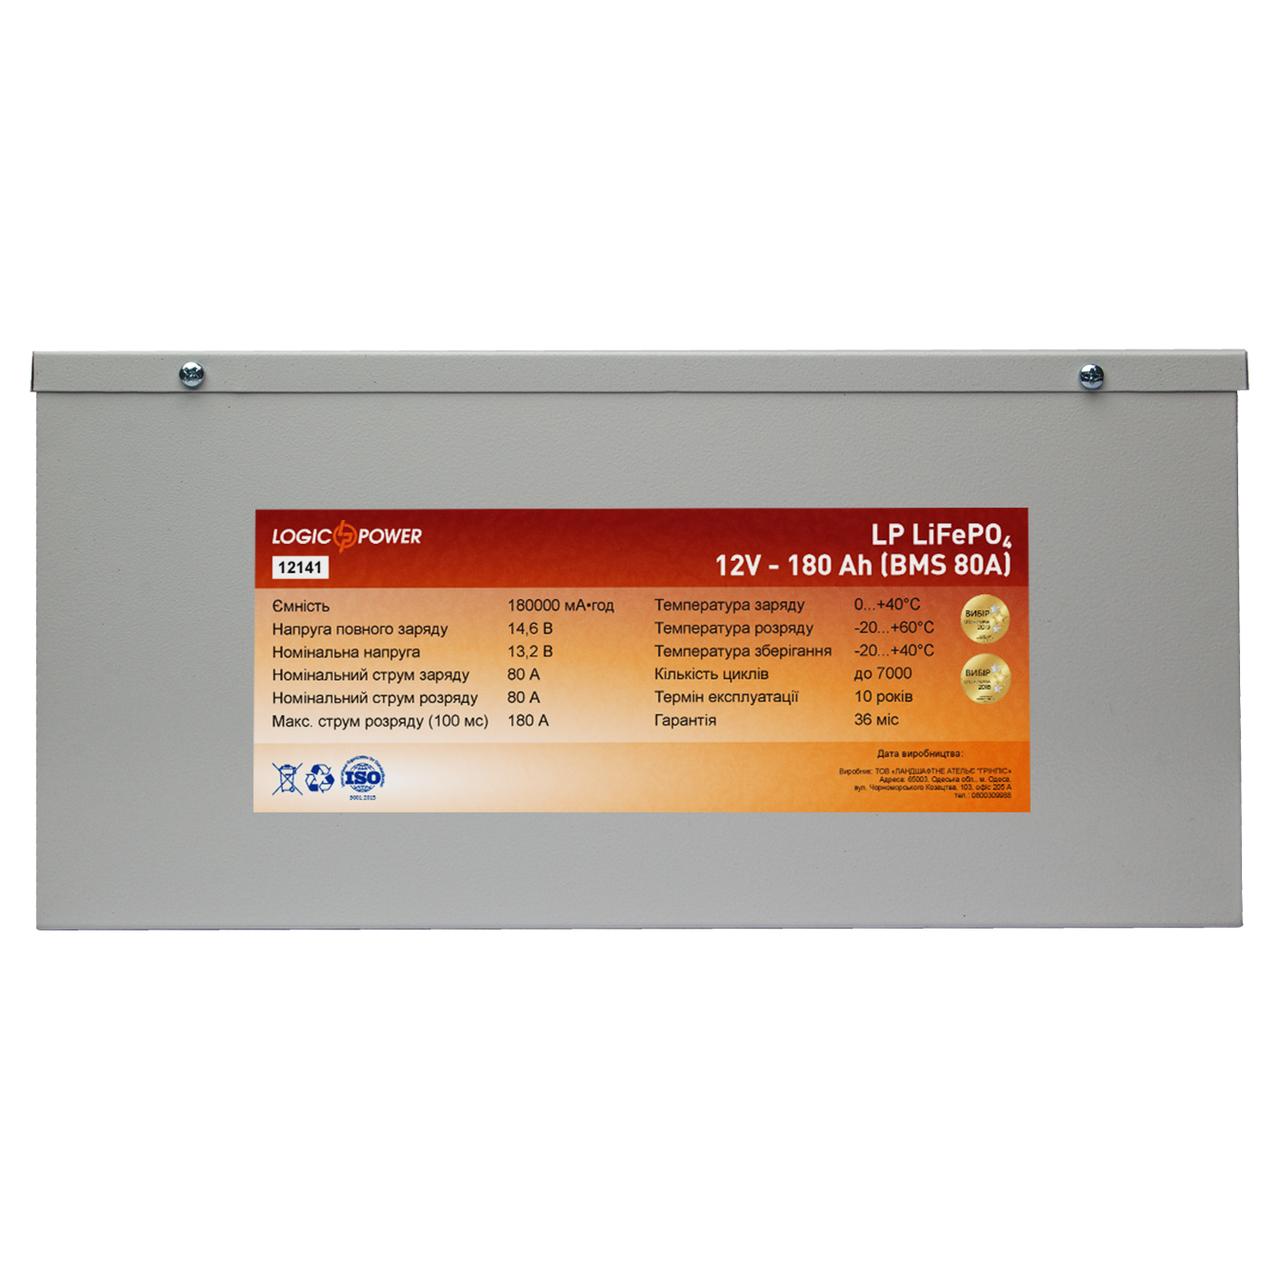 Аккумулятор LP LiFePO4 12V - 180 Ah (BMS 80A) металл